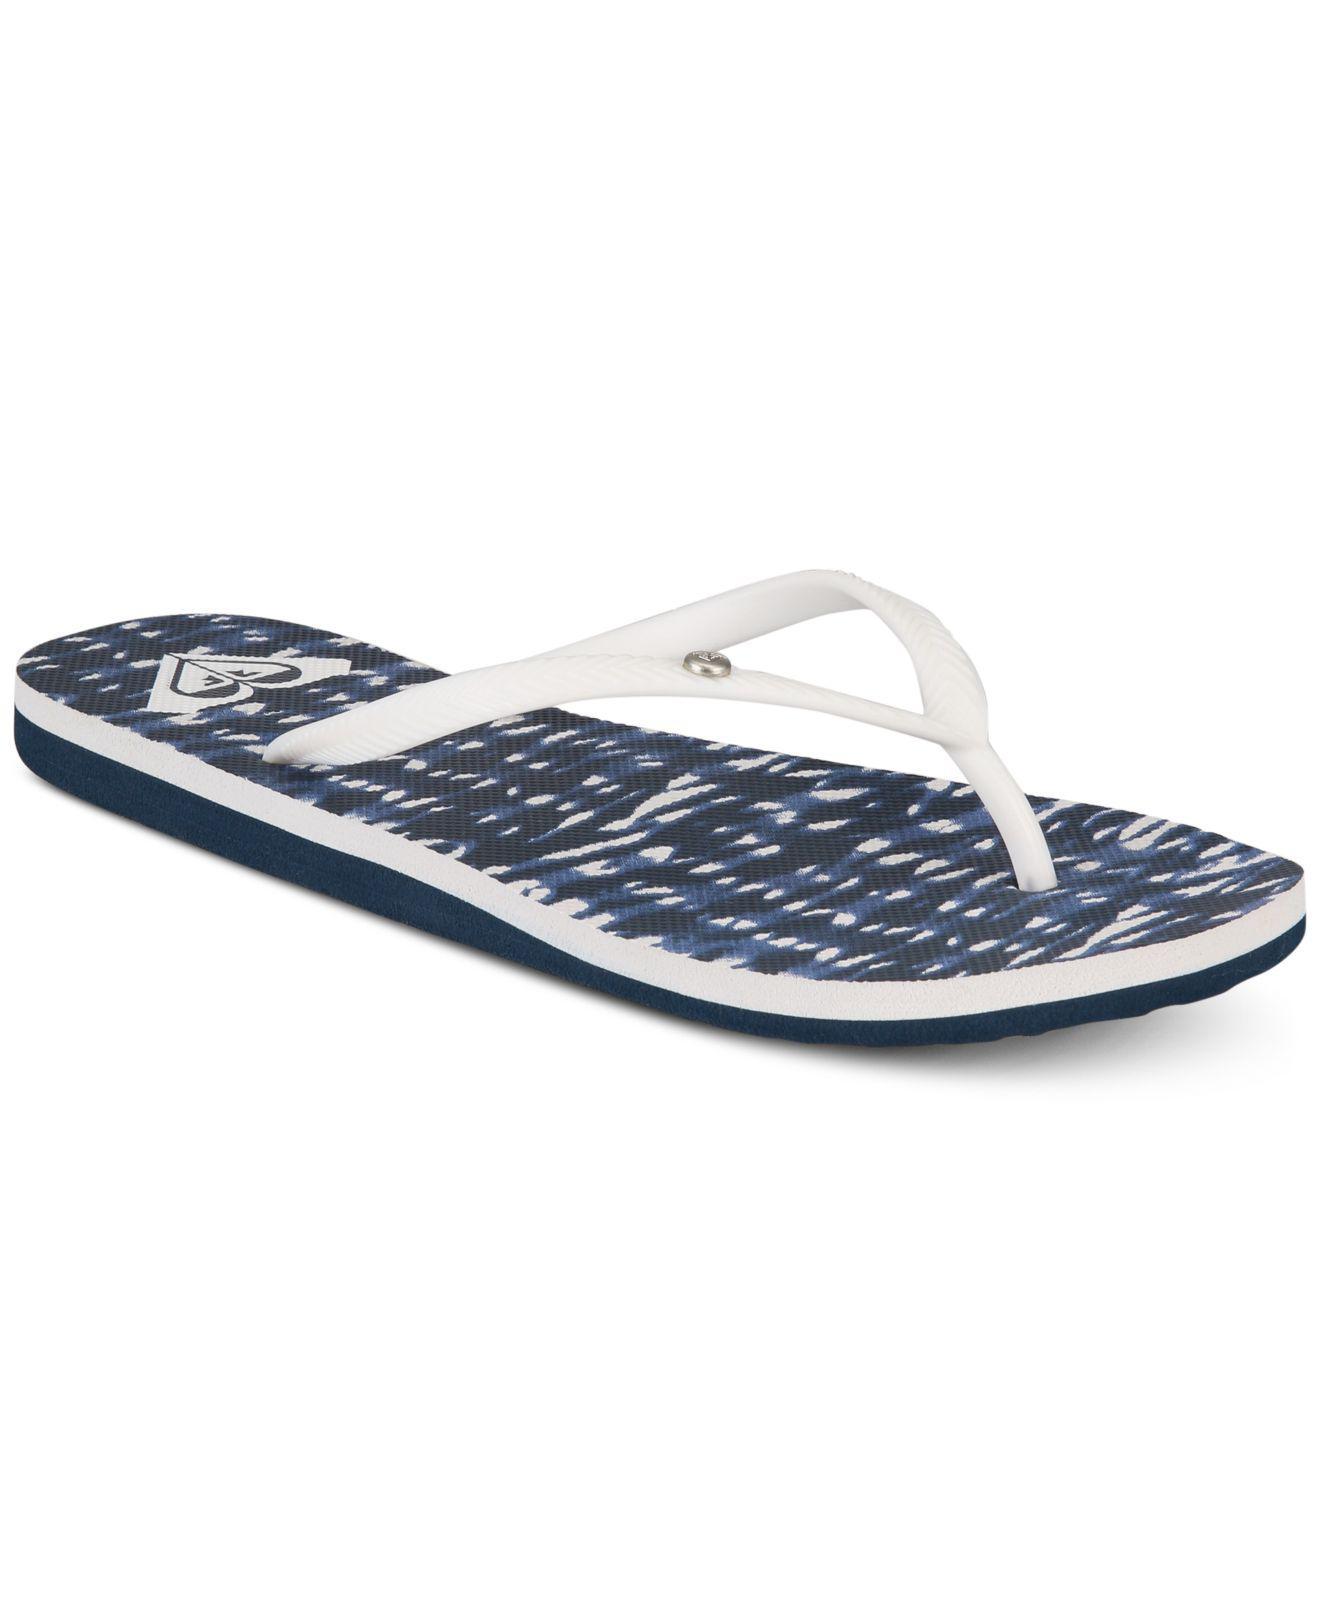 a8de7d8d6a6 Lyst - Roxy Bermuda Flip-flop Sandals in Blue